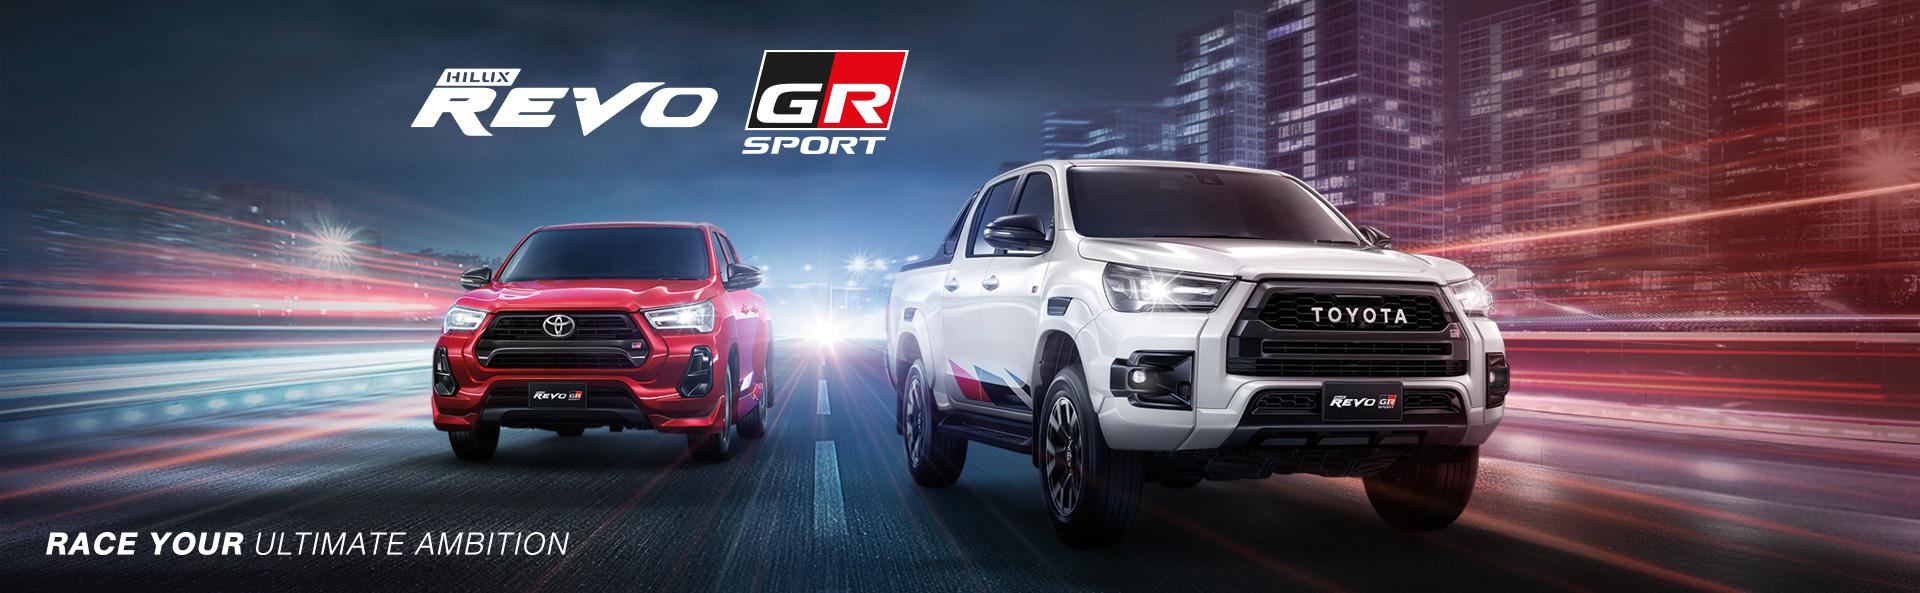 TOYOTA Hilux Revo GR Sport : โตโยต้า ไฮลักซ์ รีโว่ GR Sport